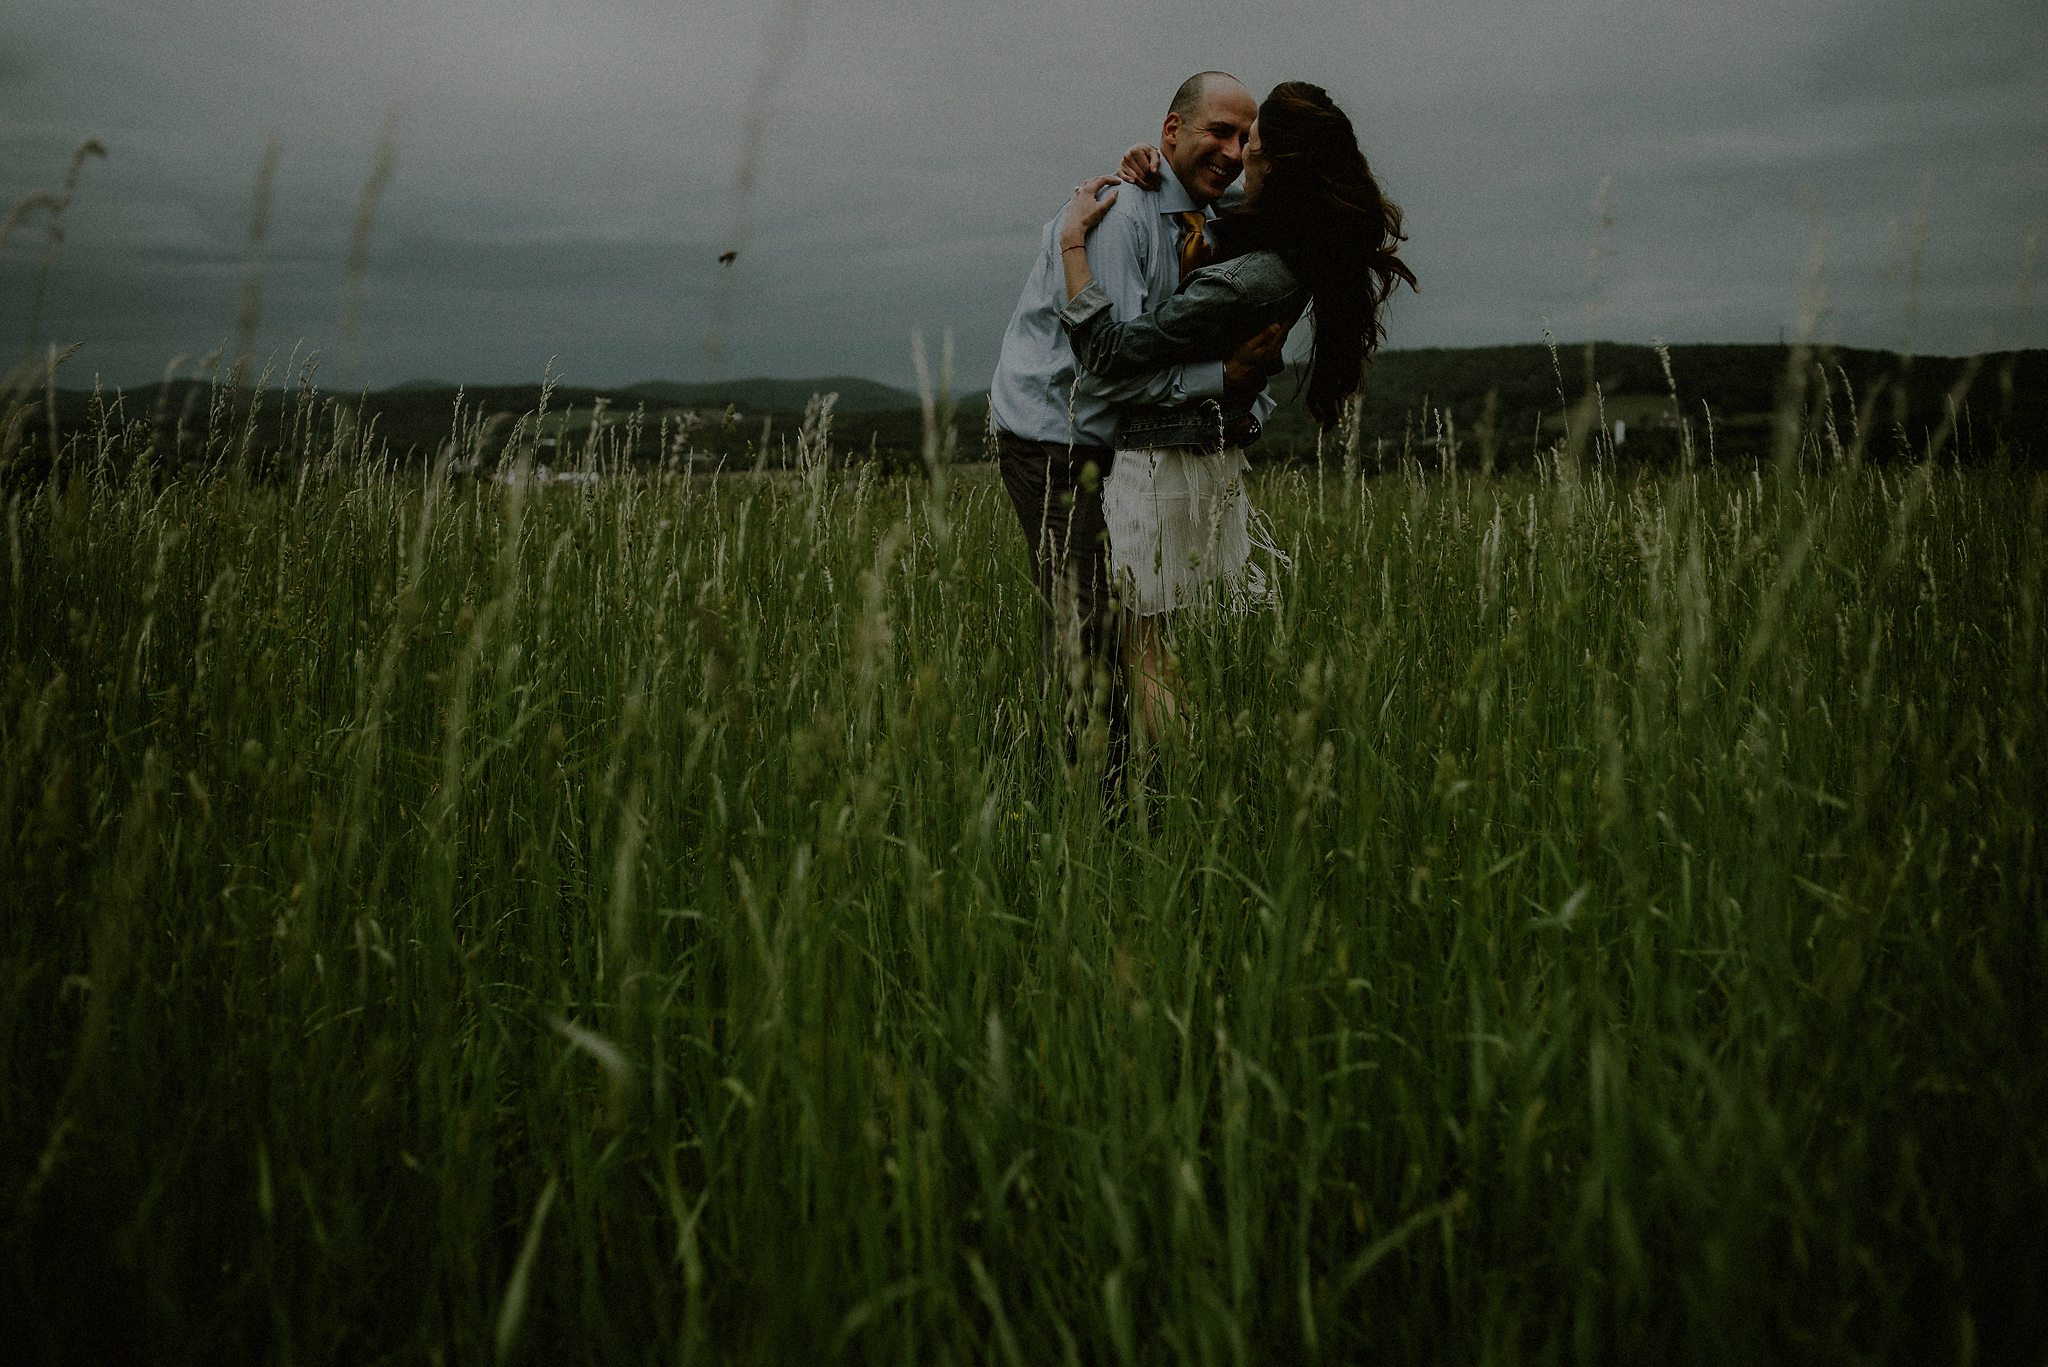 wedding couple in a field